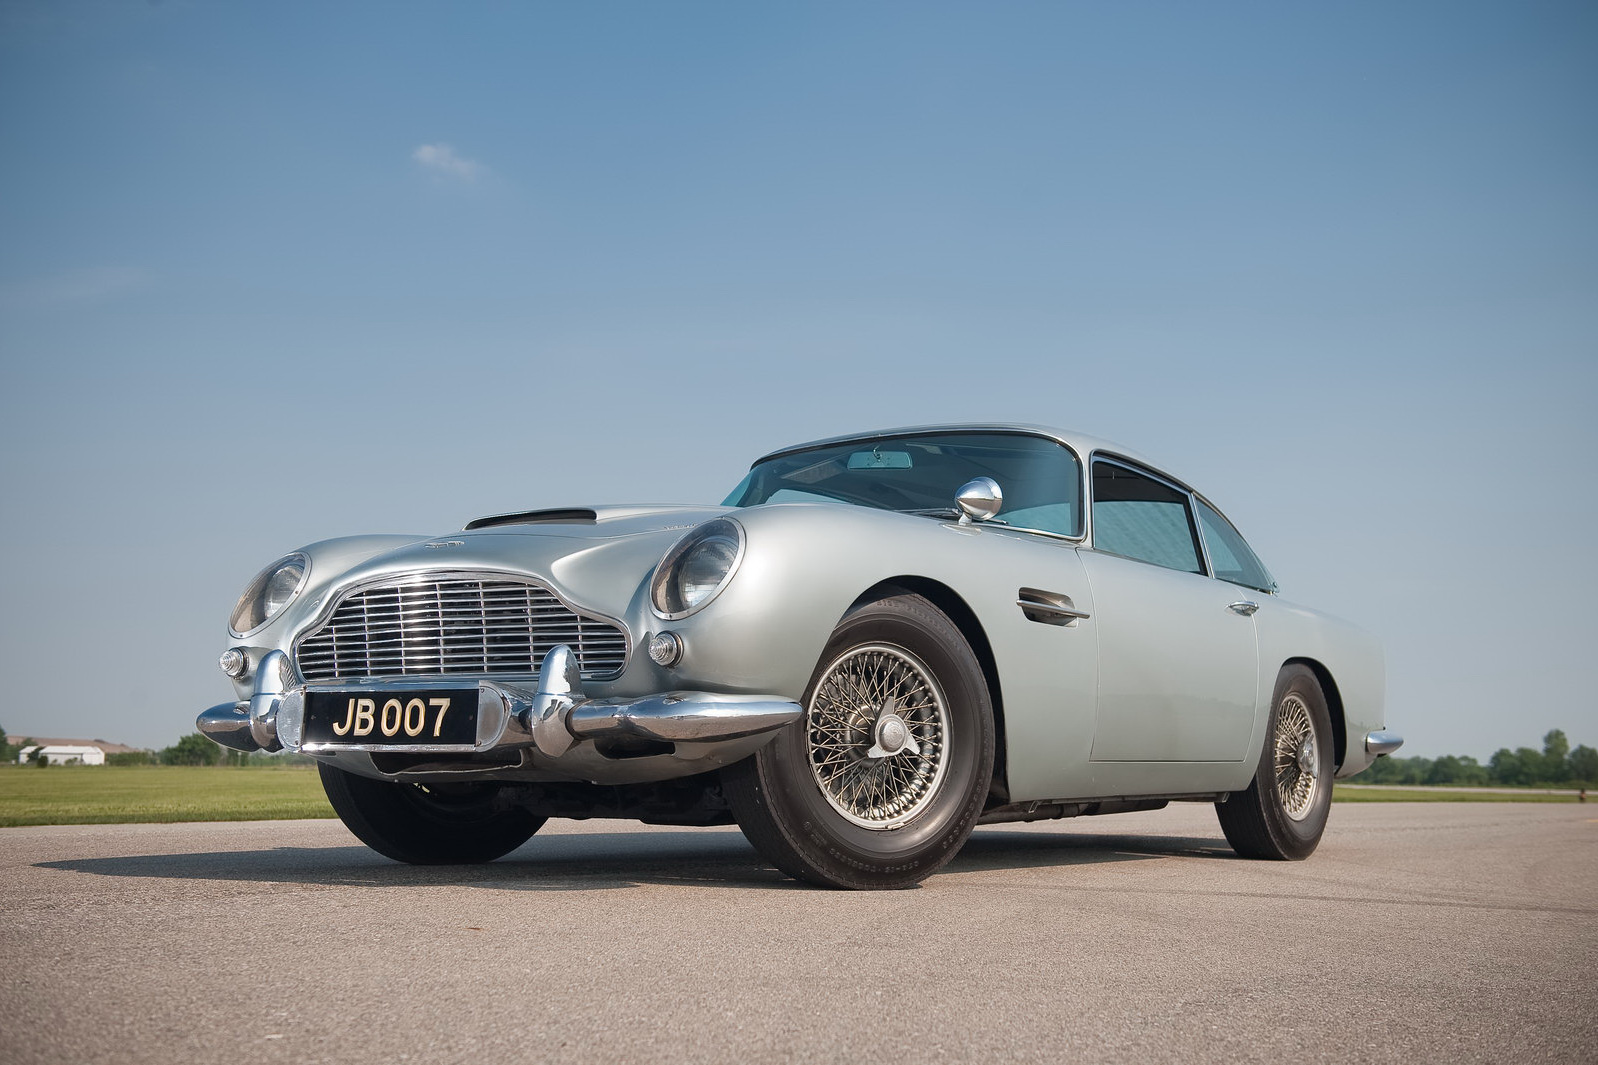 james bond 1964 aston martin db5 108 james bonds original 007 aston. Cars Review. Best American Auto & Cars Review